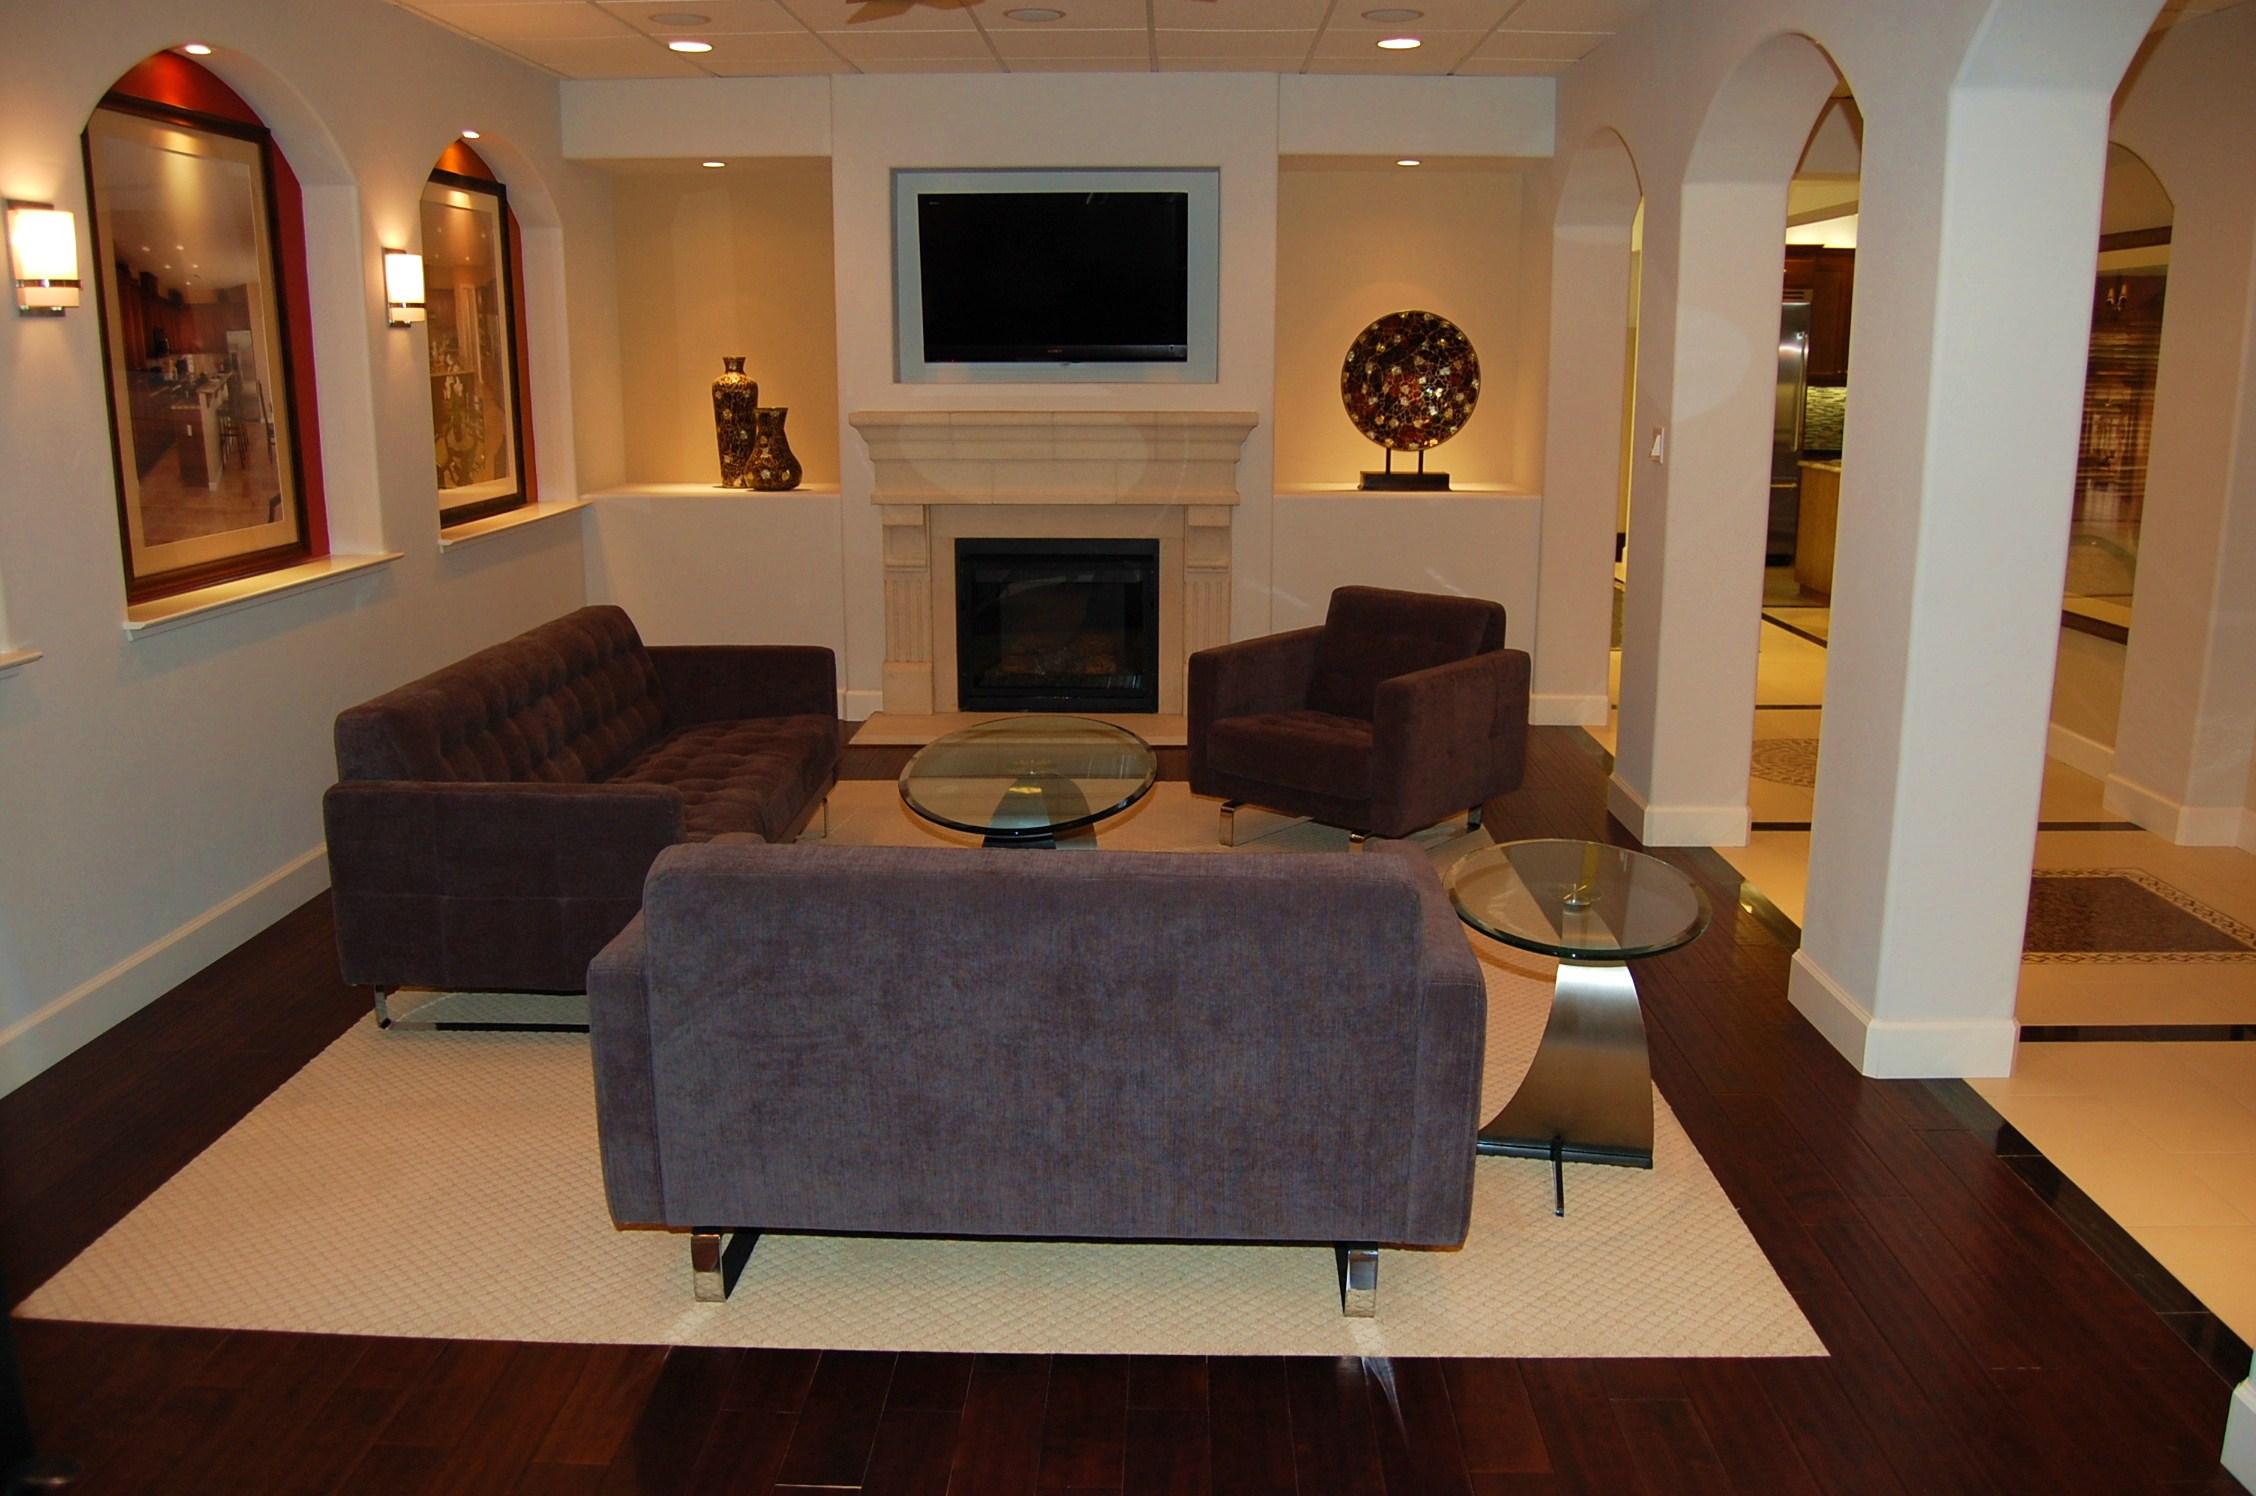 Stunning Lennar Homes Design Center Images - Amazing House ...